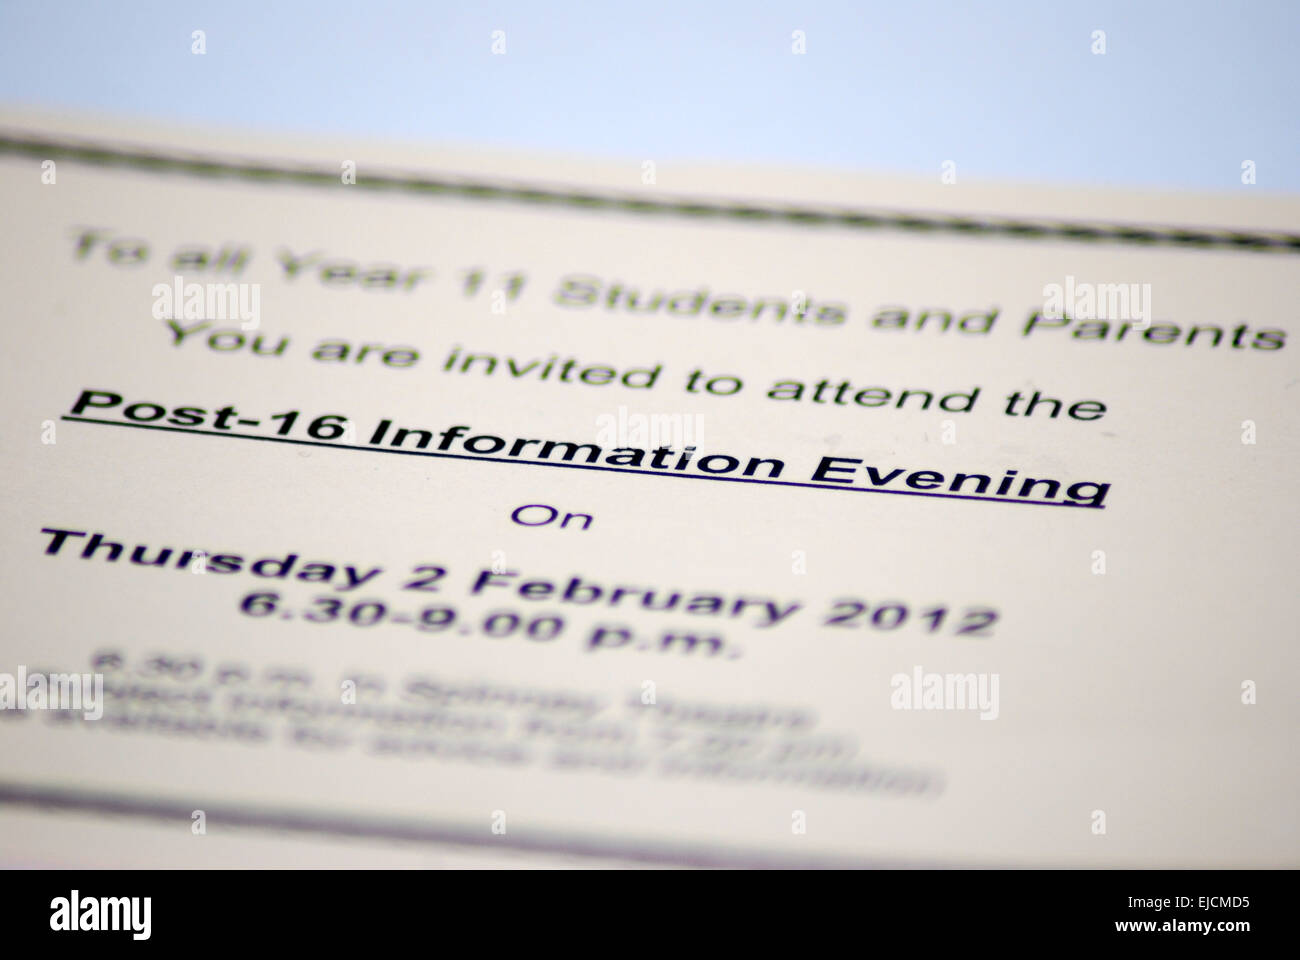 Parents evening invitation letter - Stock Image